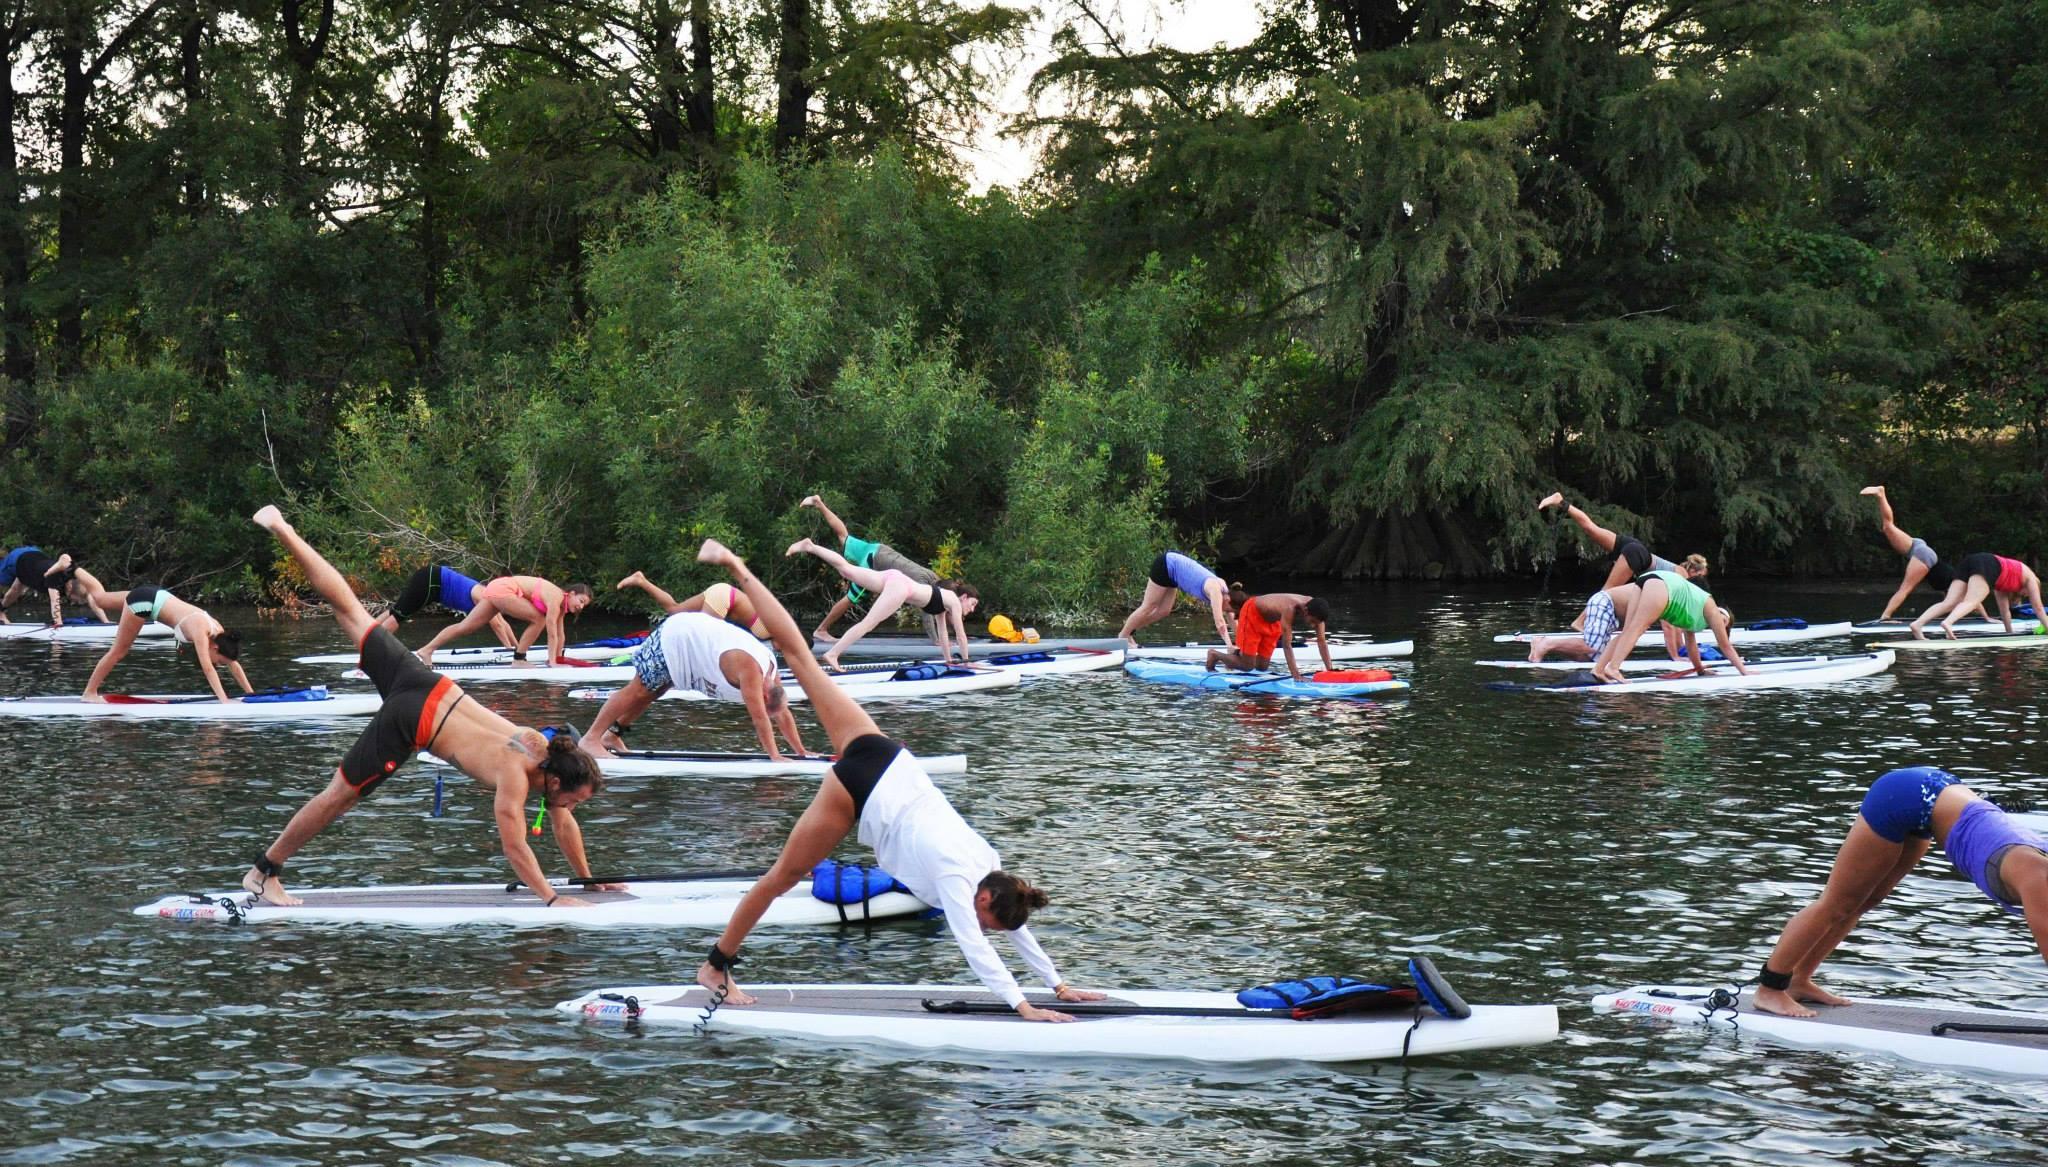 SUPATX SUP Yoga World Record